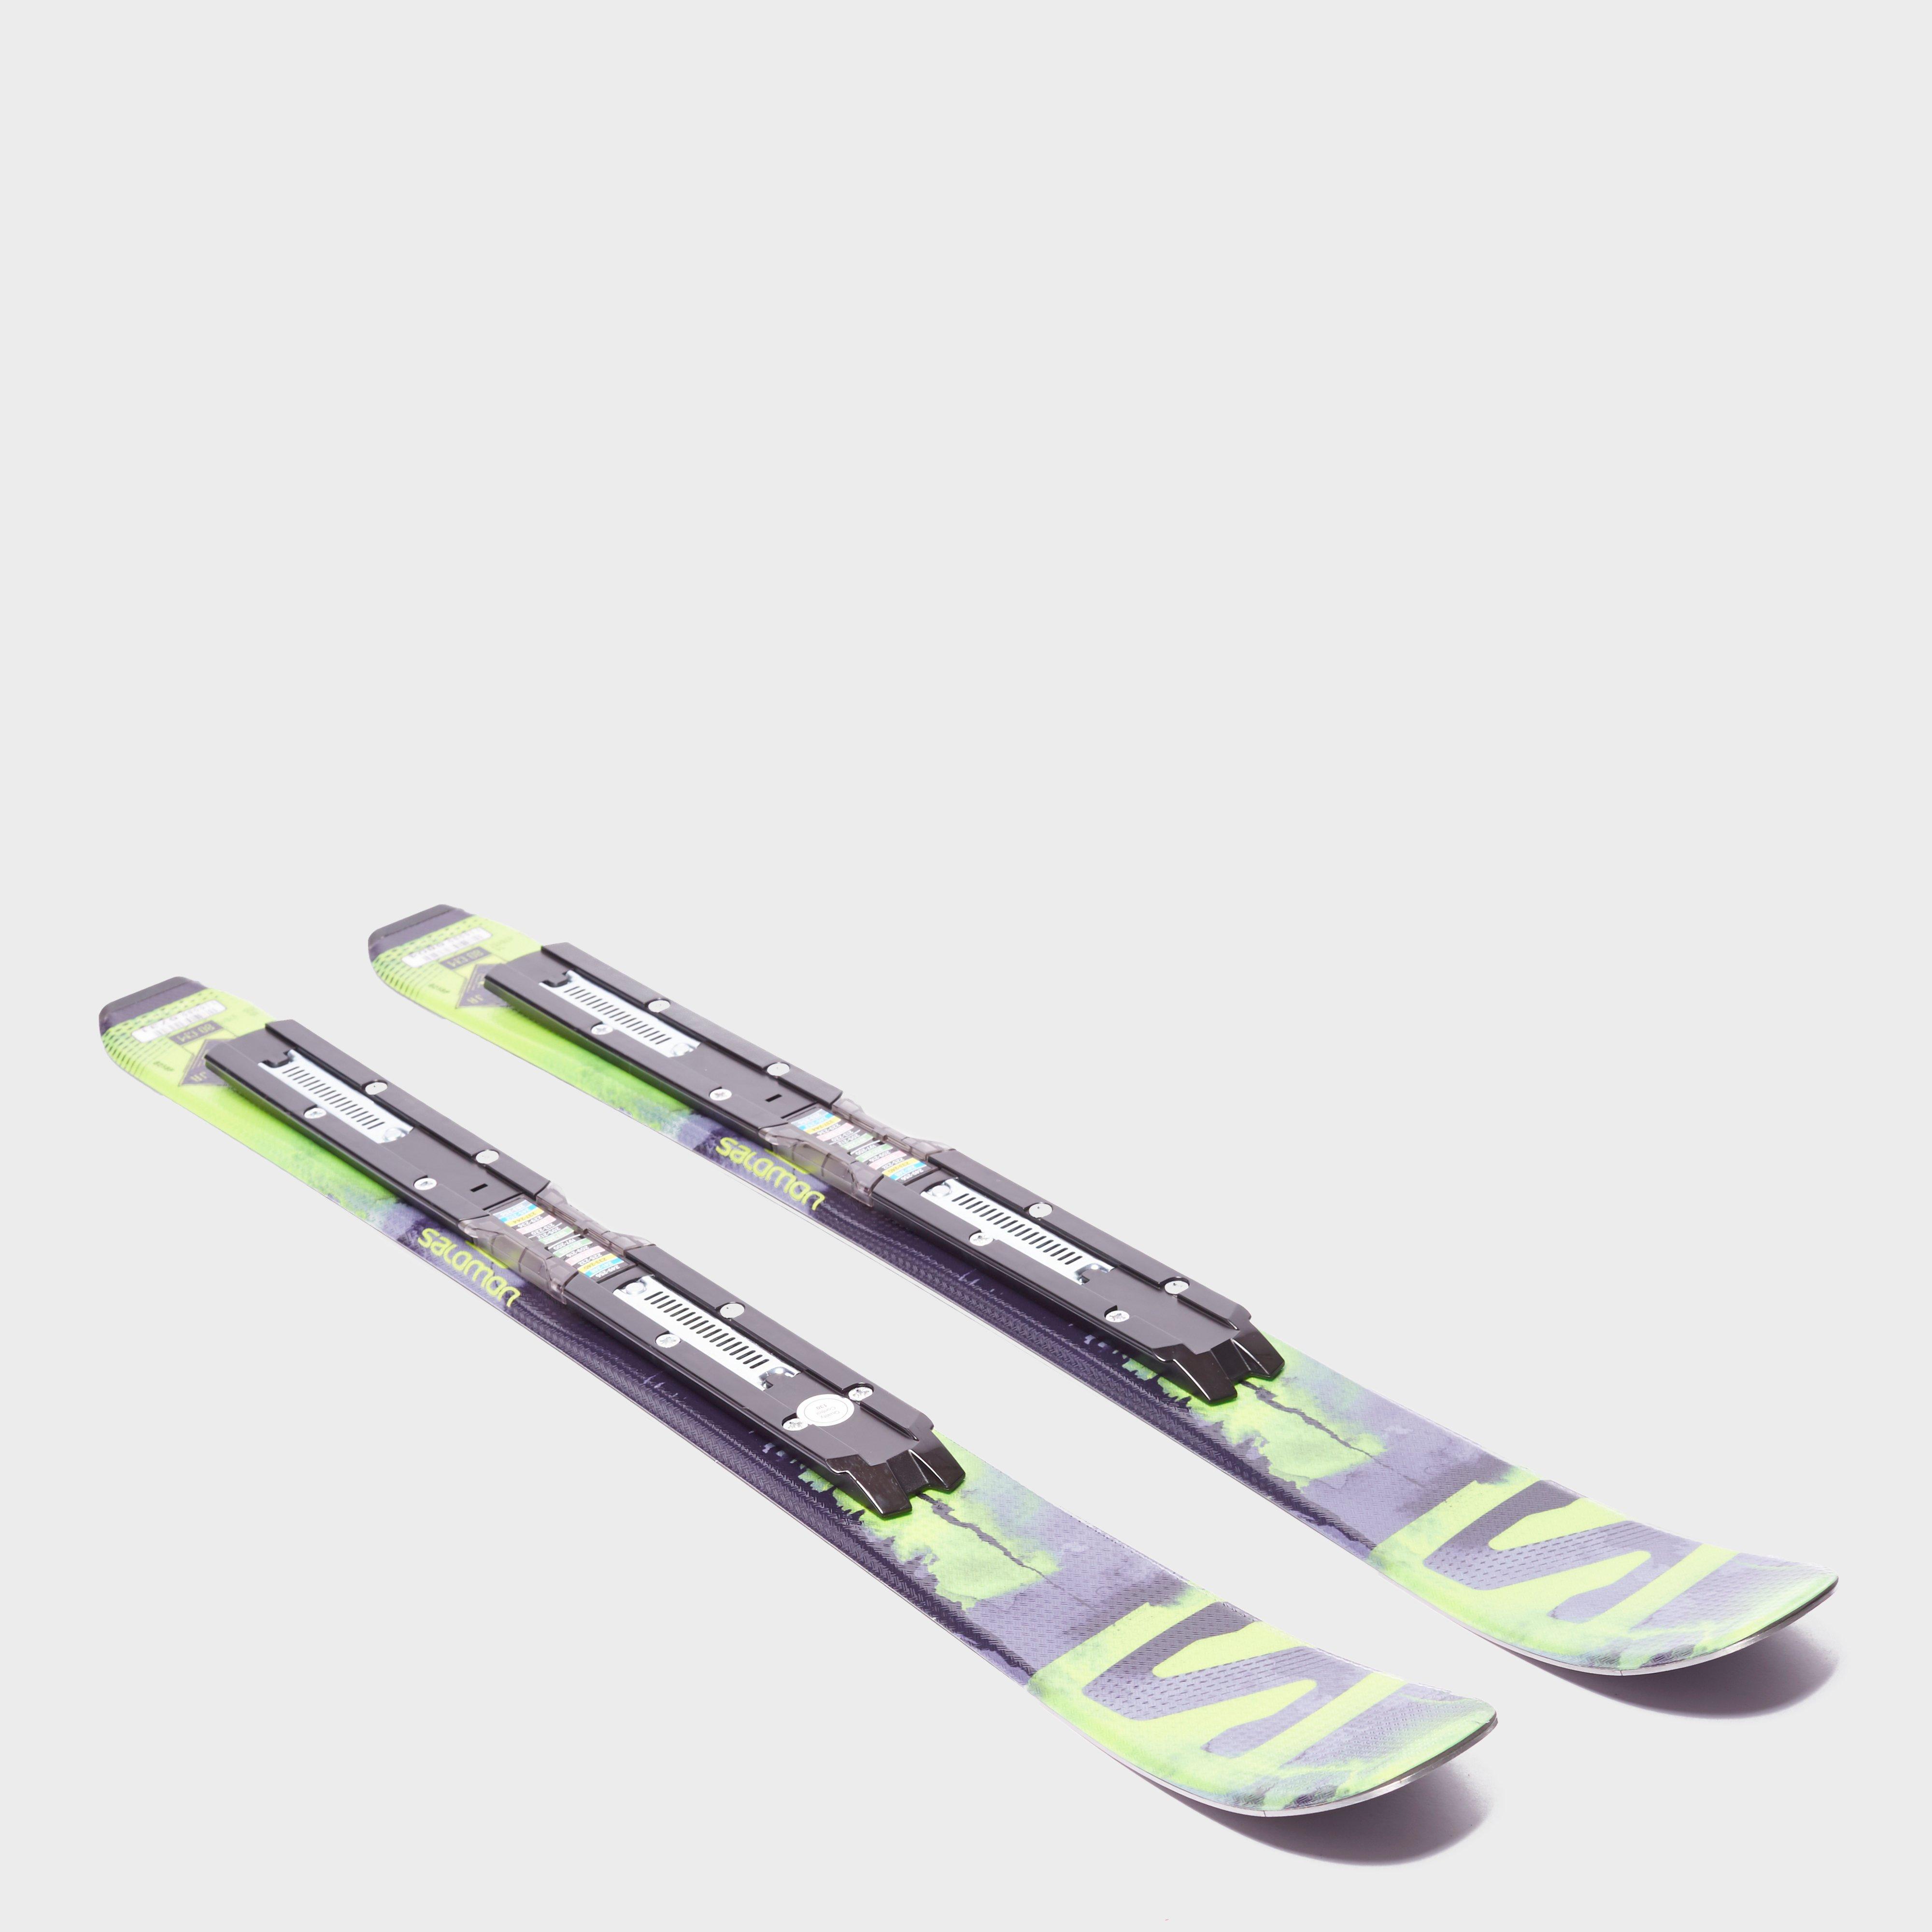 Salomon Q-Lux Jr XS Skis with EZY 7 Bindings, Black